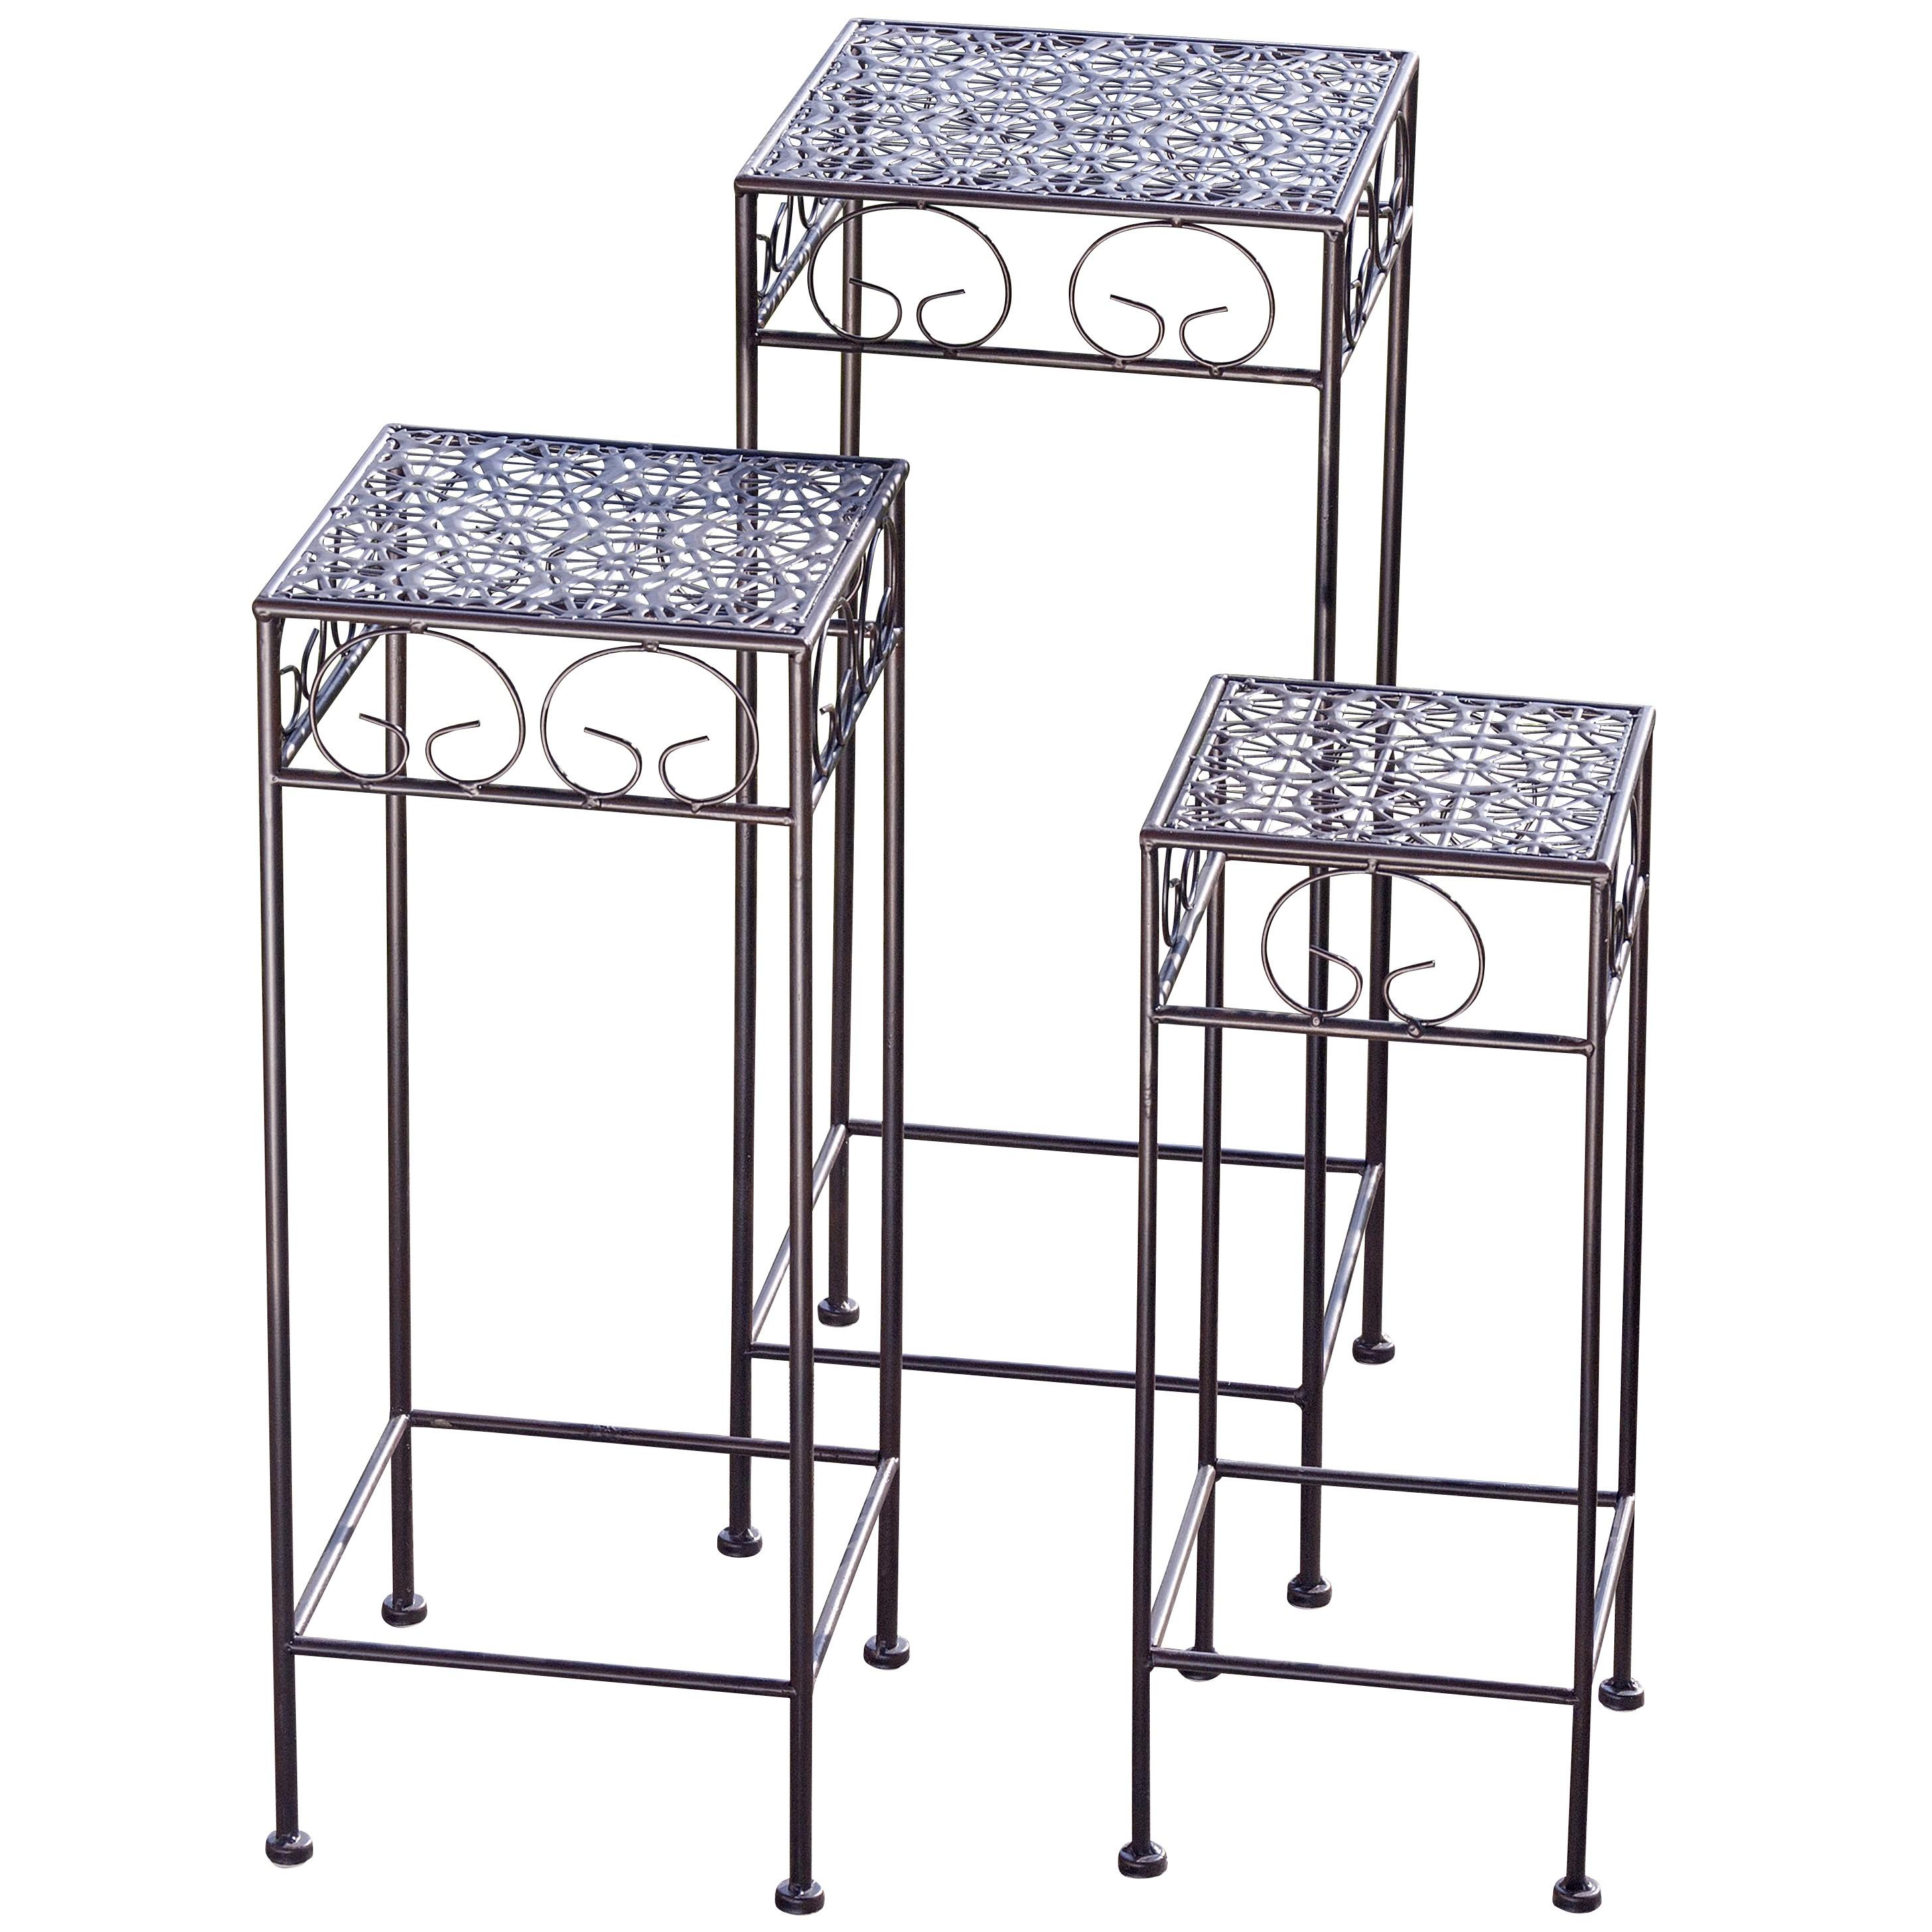 porte plantes ikara 3 l ments fer marron maison belfort meubles en ligne. Black Bedroom Furniture Sets. Home Design Ideas